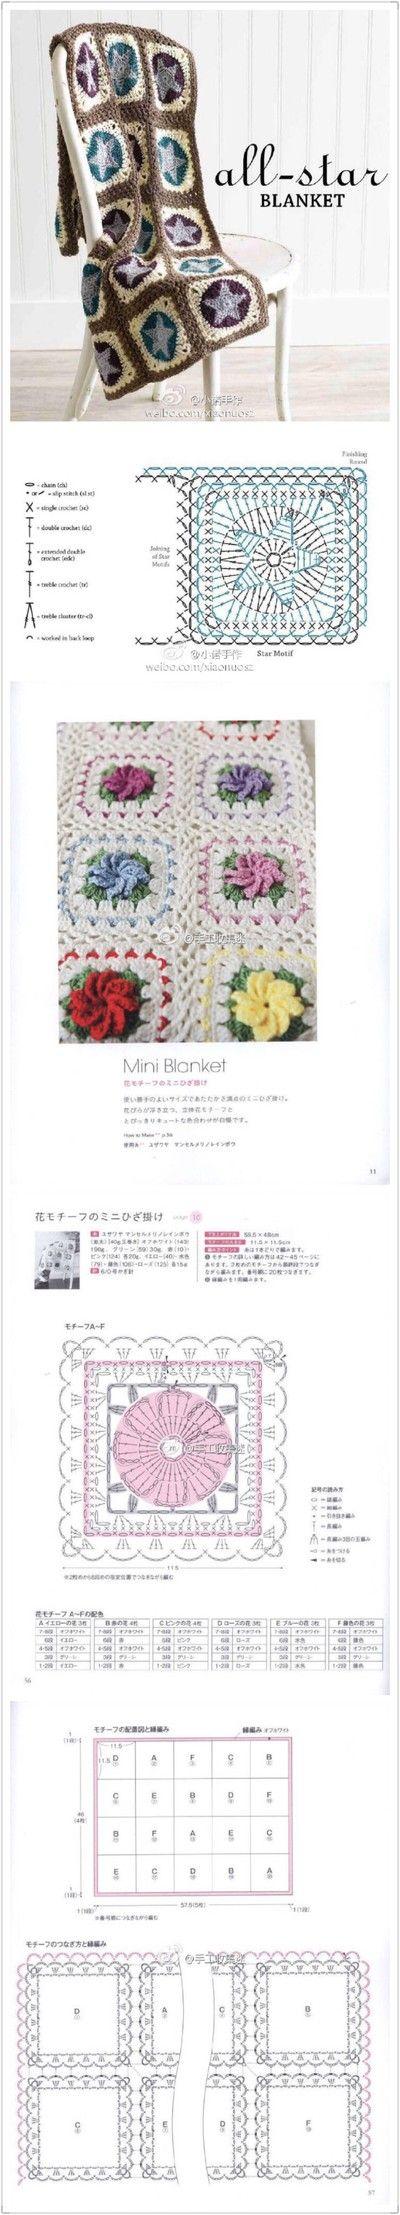 1377 best MANTAS ❇ images on Pinterest   Crochet motif, Crochet ...